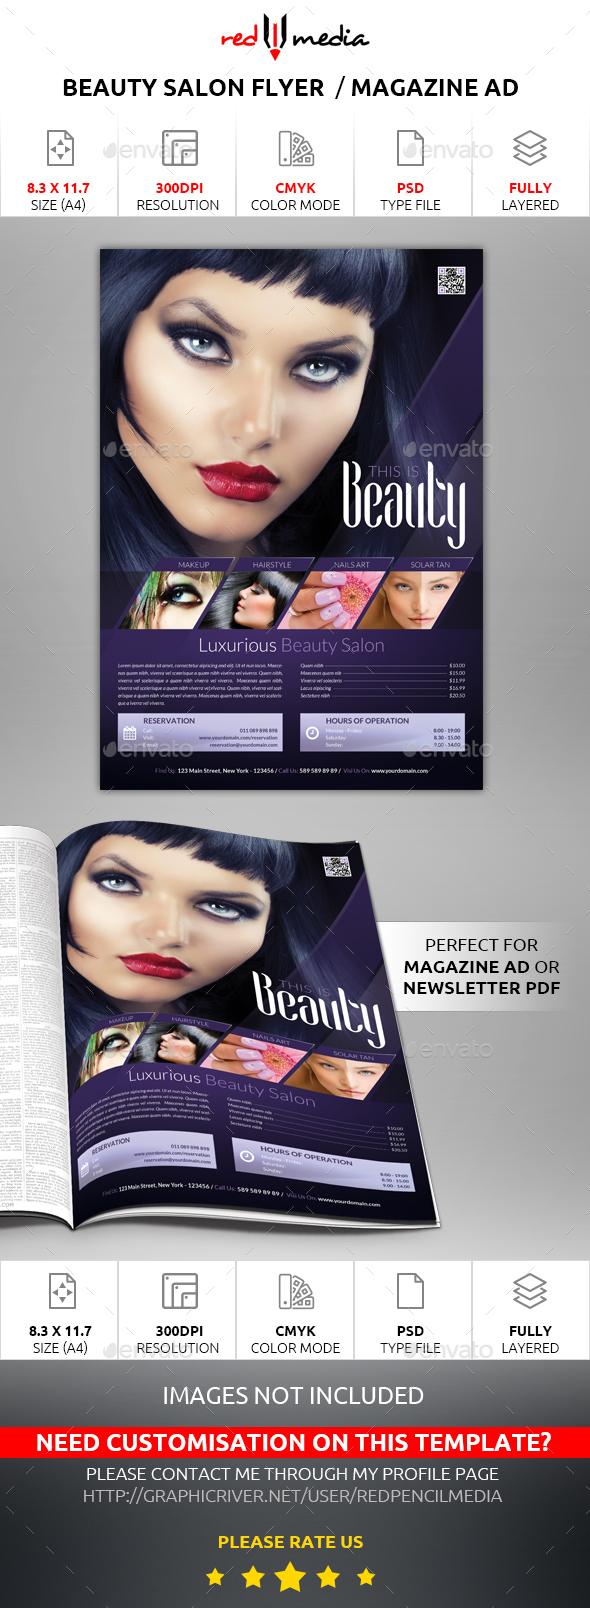 Beauty Salon Flyer / Magazine AD - Commerce Flyers